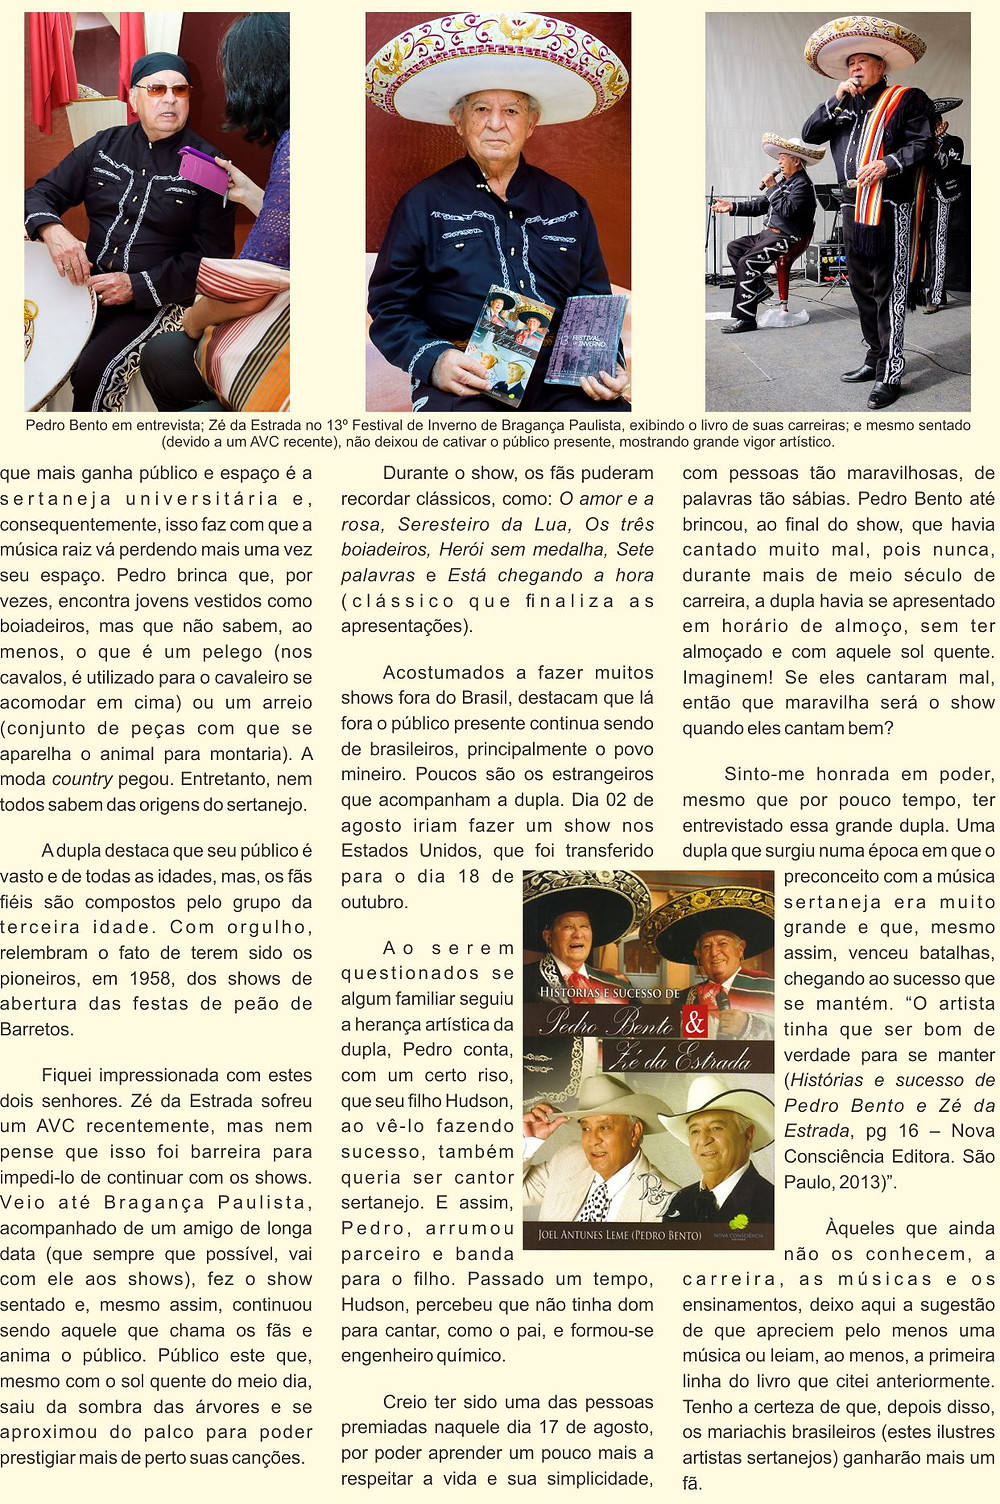 Pedro_Bento_&_Zé_da_Estrada_-_2014_-_III.jpg